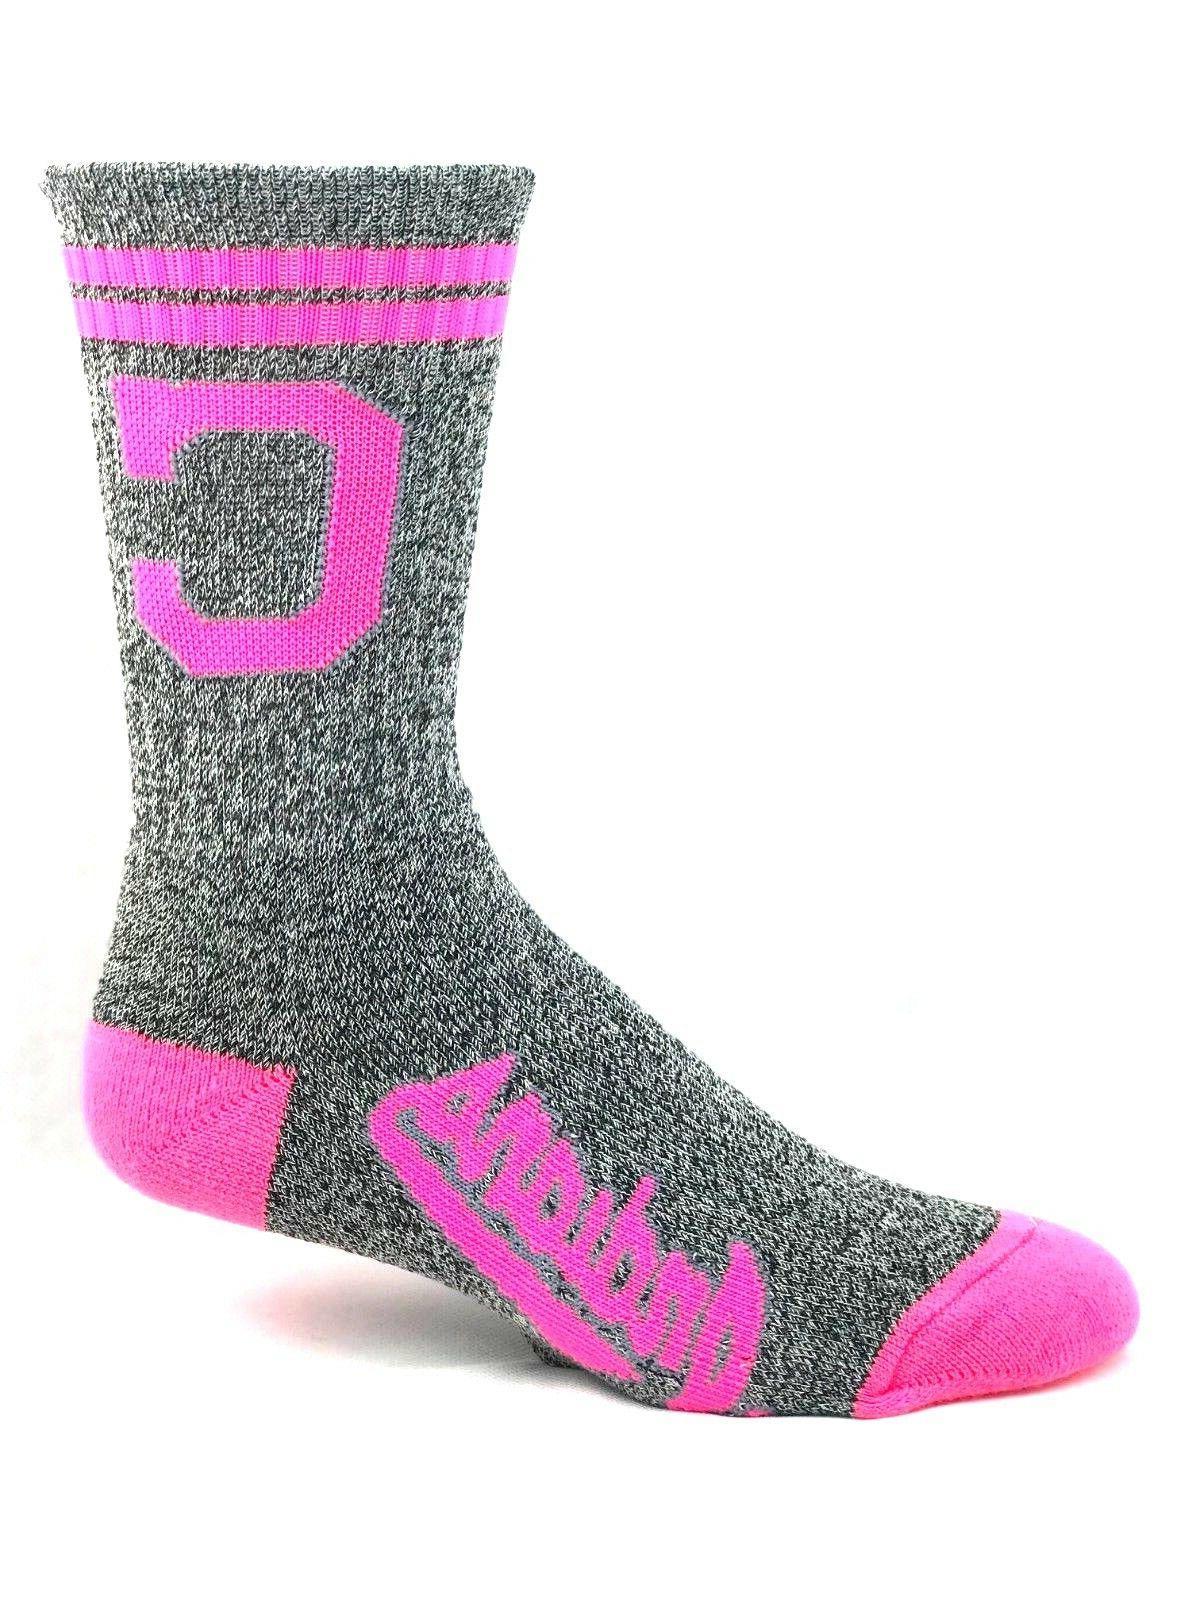 cleveland indians baseball marbled crew socks pink